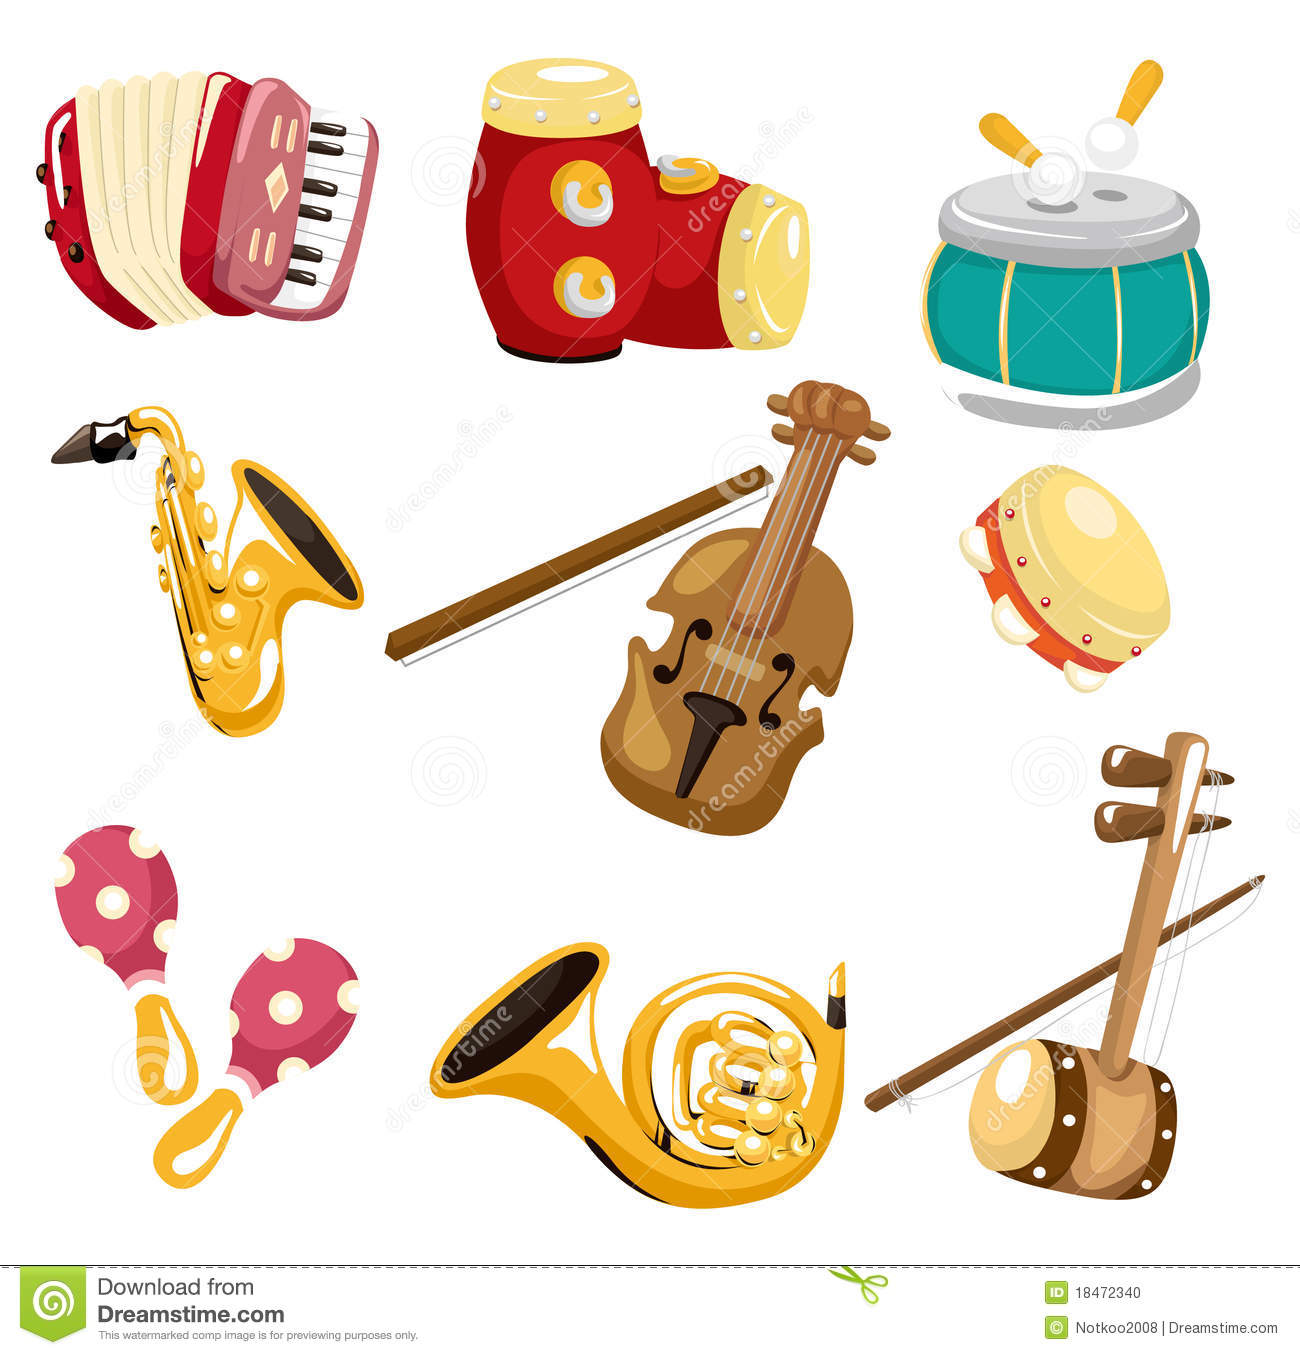 Cartoon musical instruments clipart.